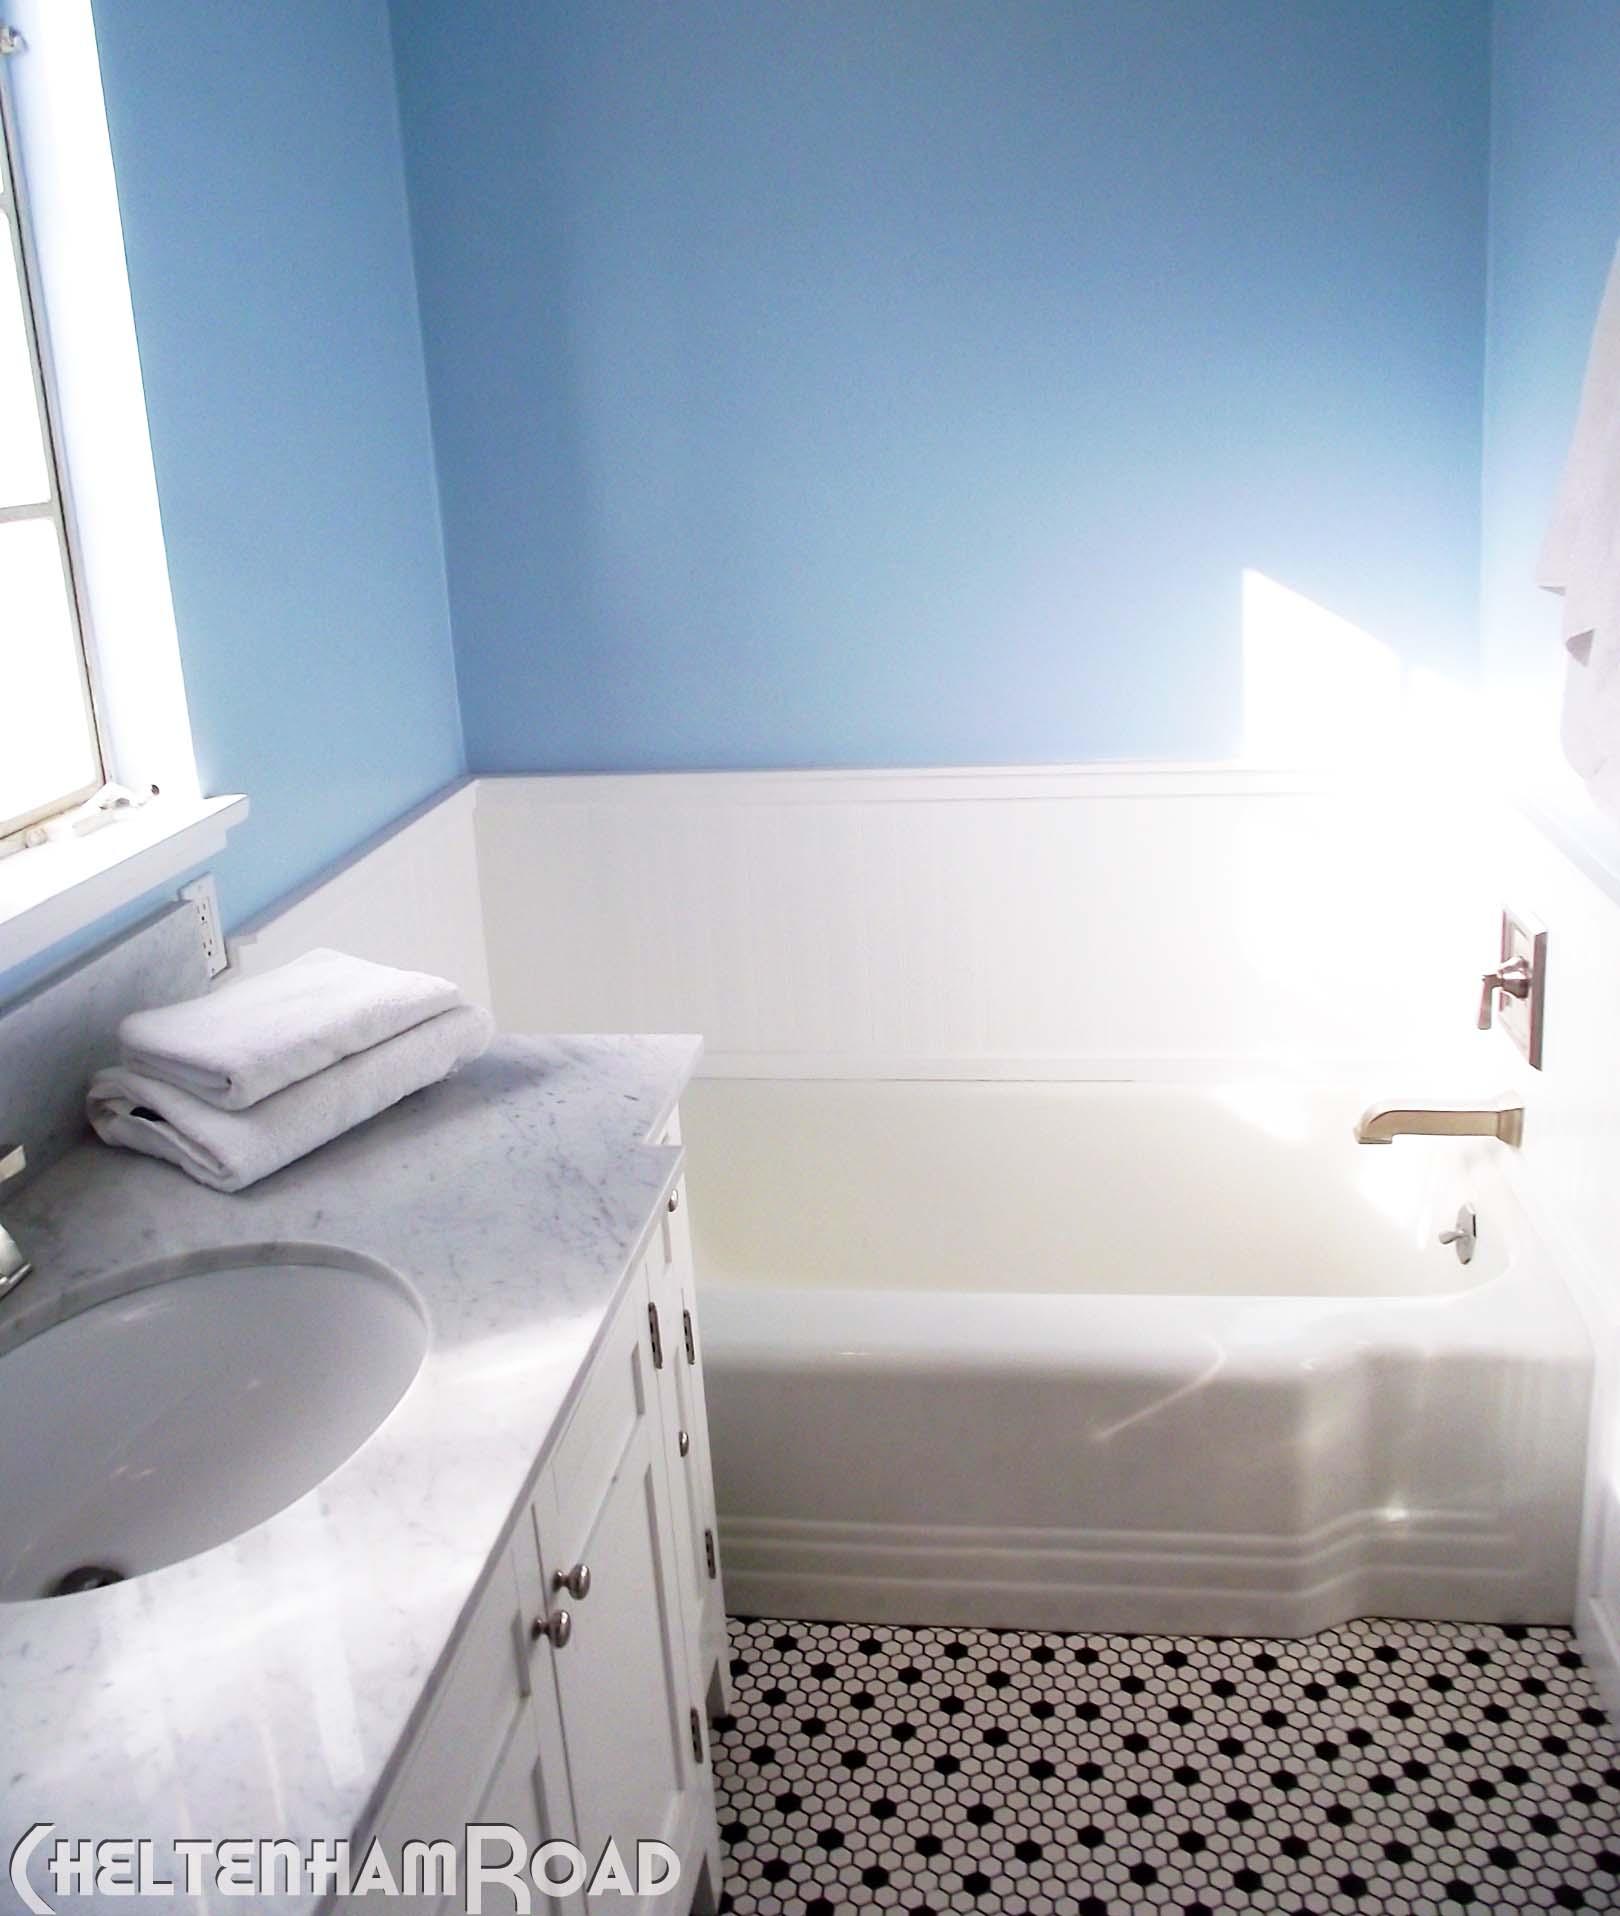 bathroom remodel | cheltenhamroad